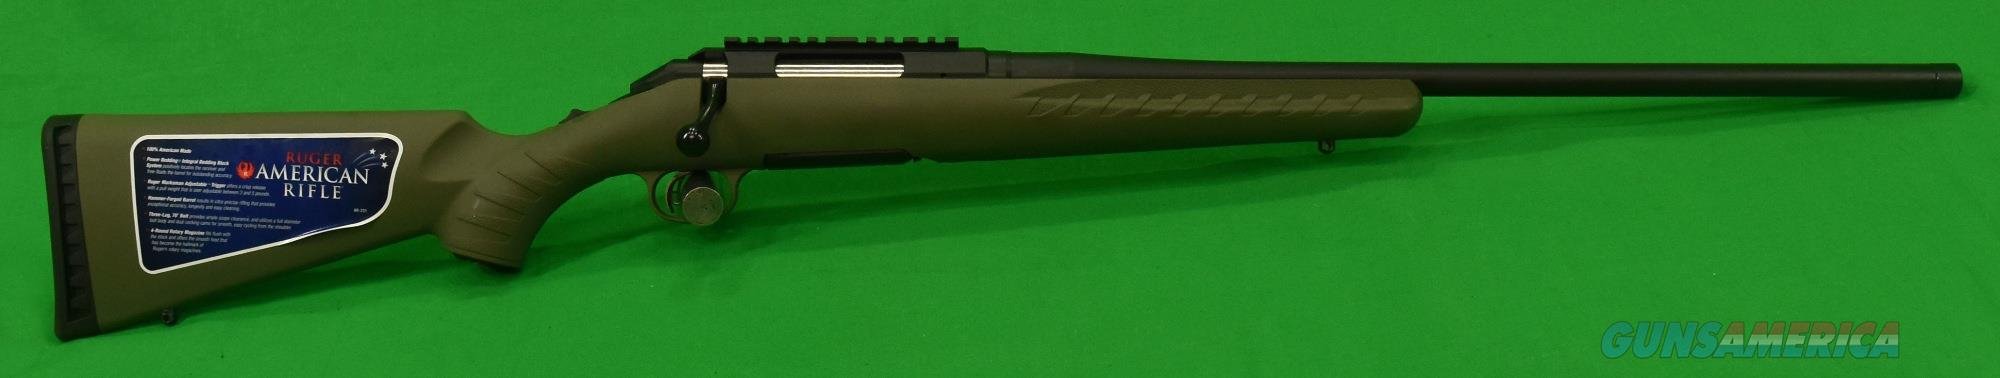 American Rifle Predator 6.5CM 22In  6973  Guns > Rifles > Ruger Rifles > American Rifle